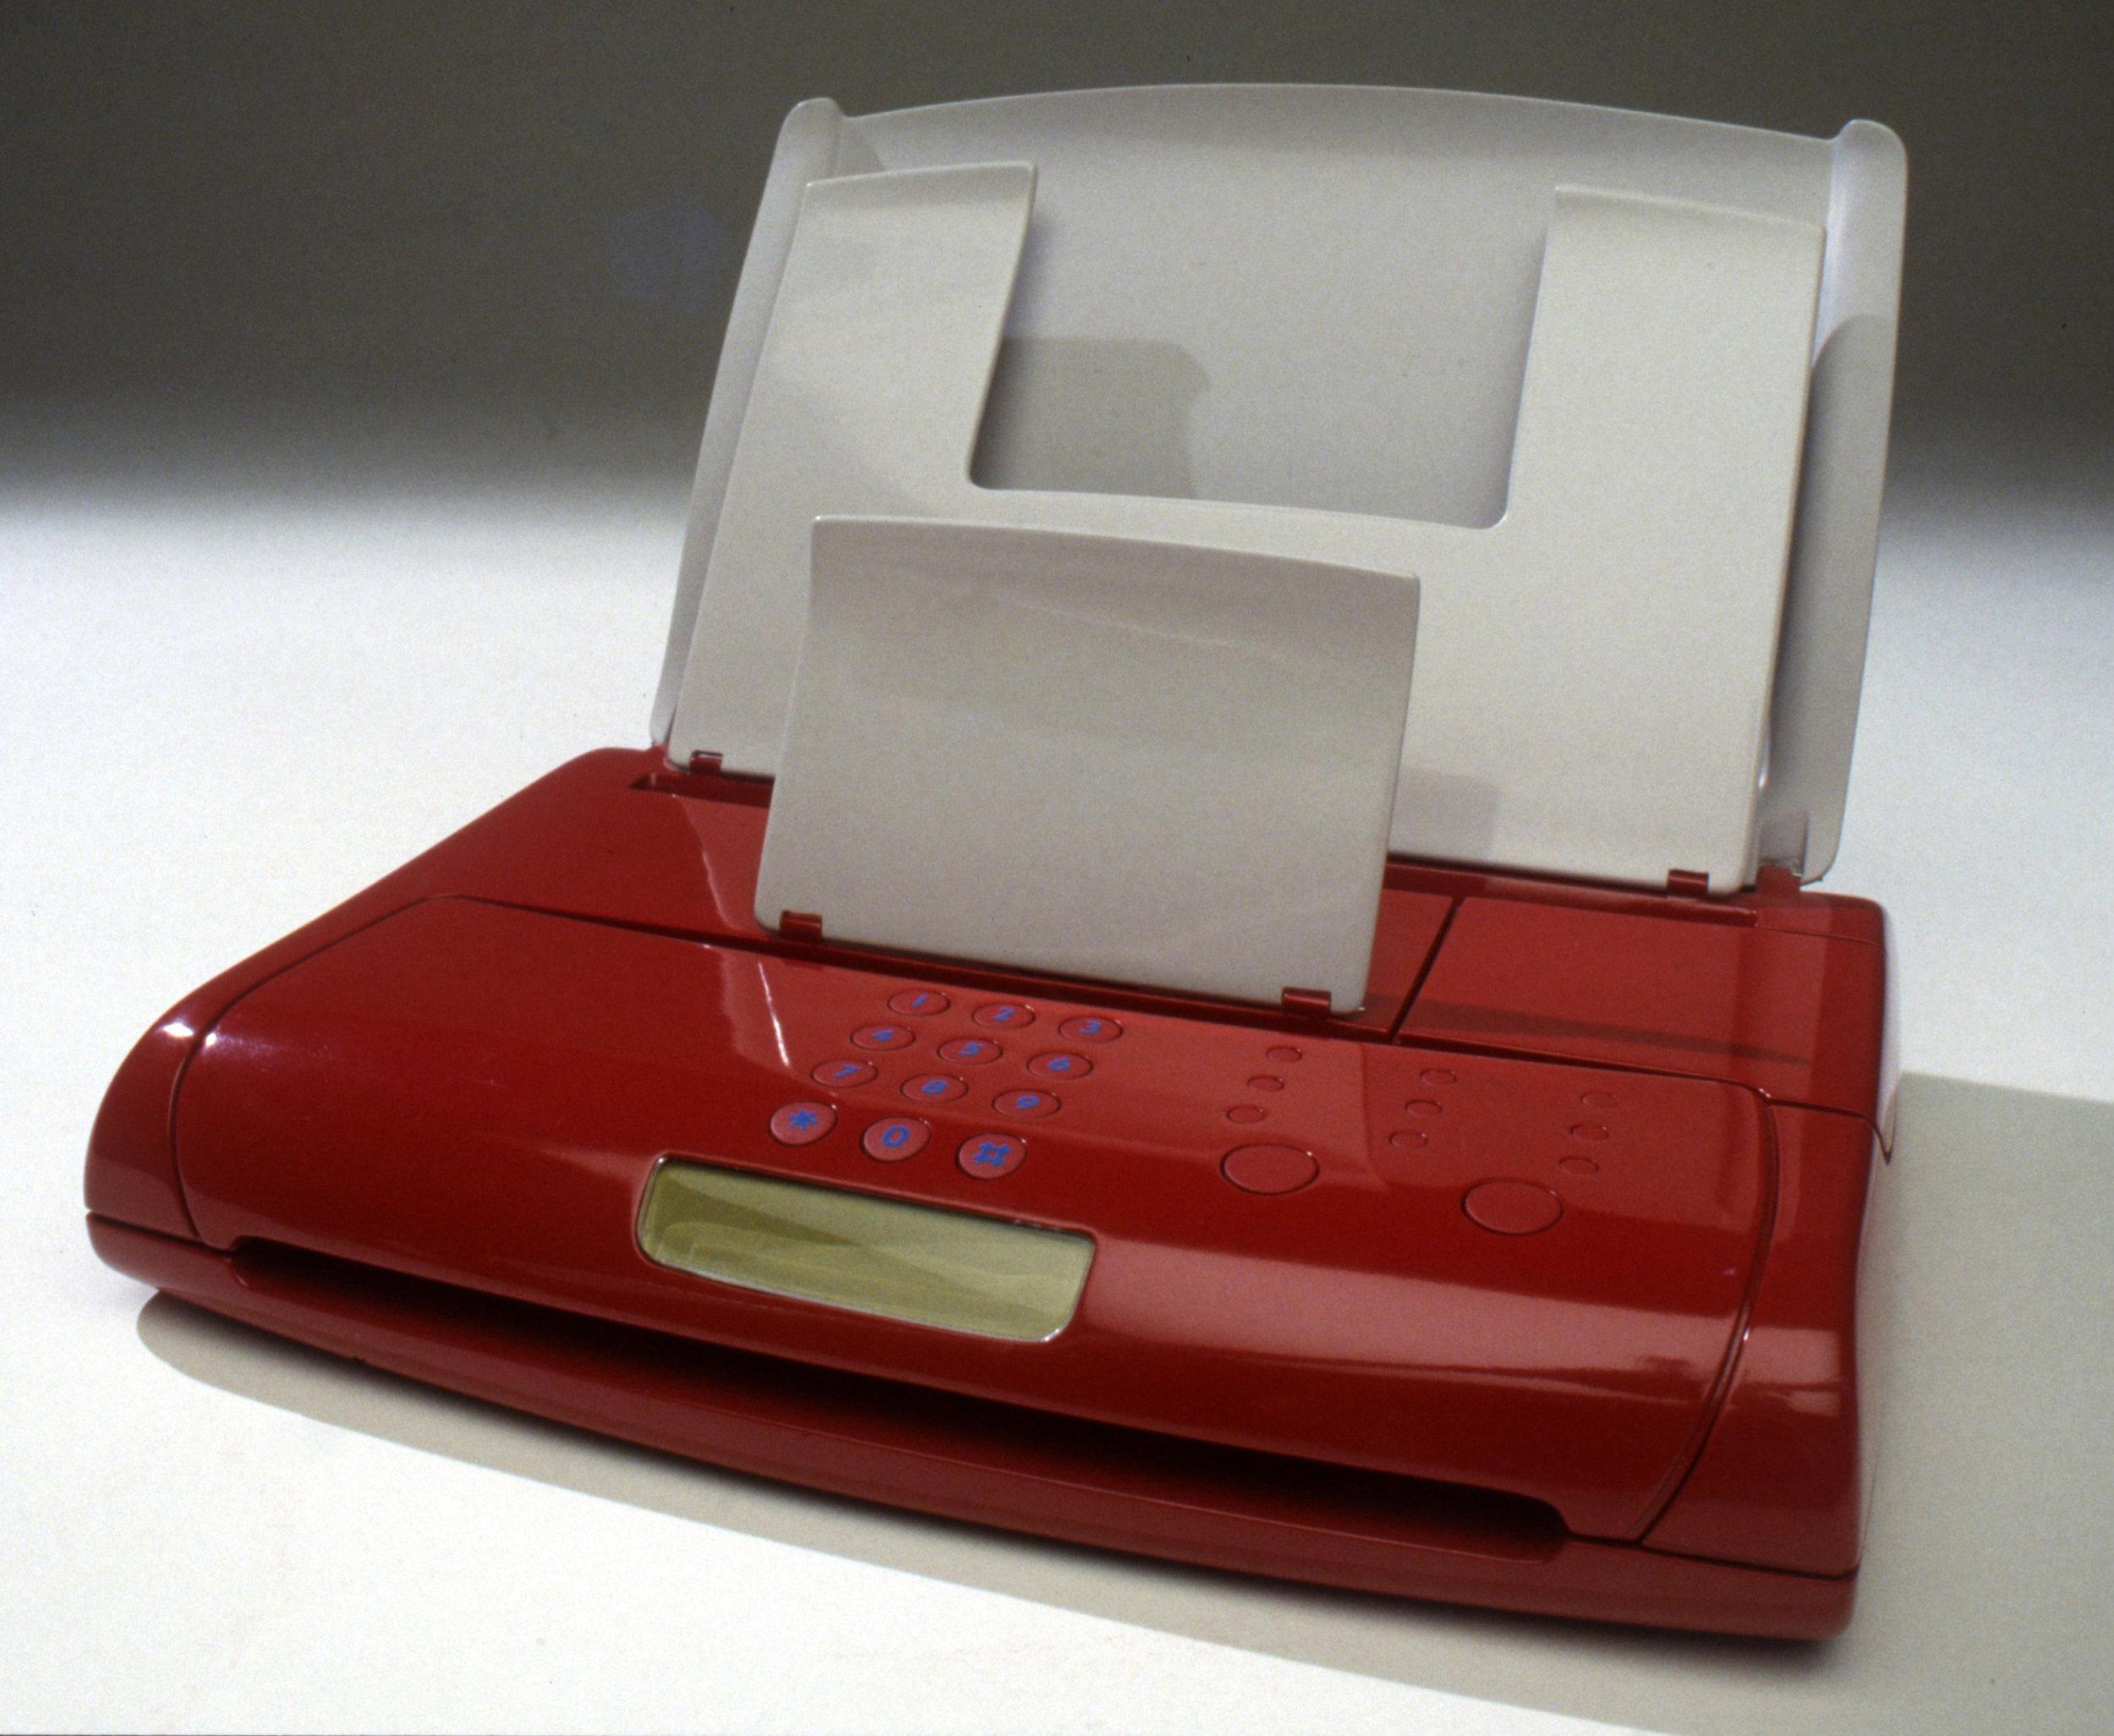 2 Olivetti_Model_Fax_Red_Photos(04).jpg